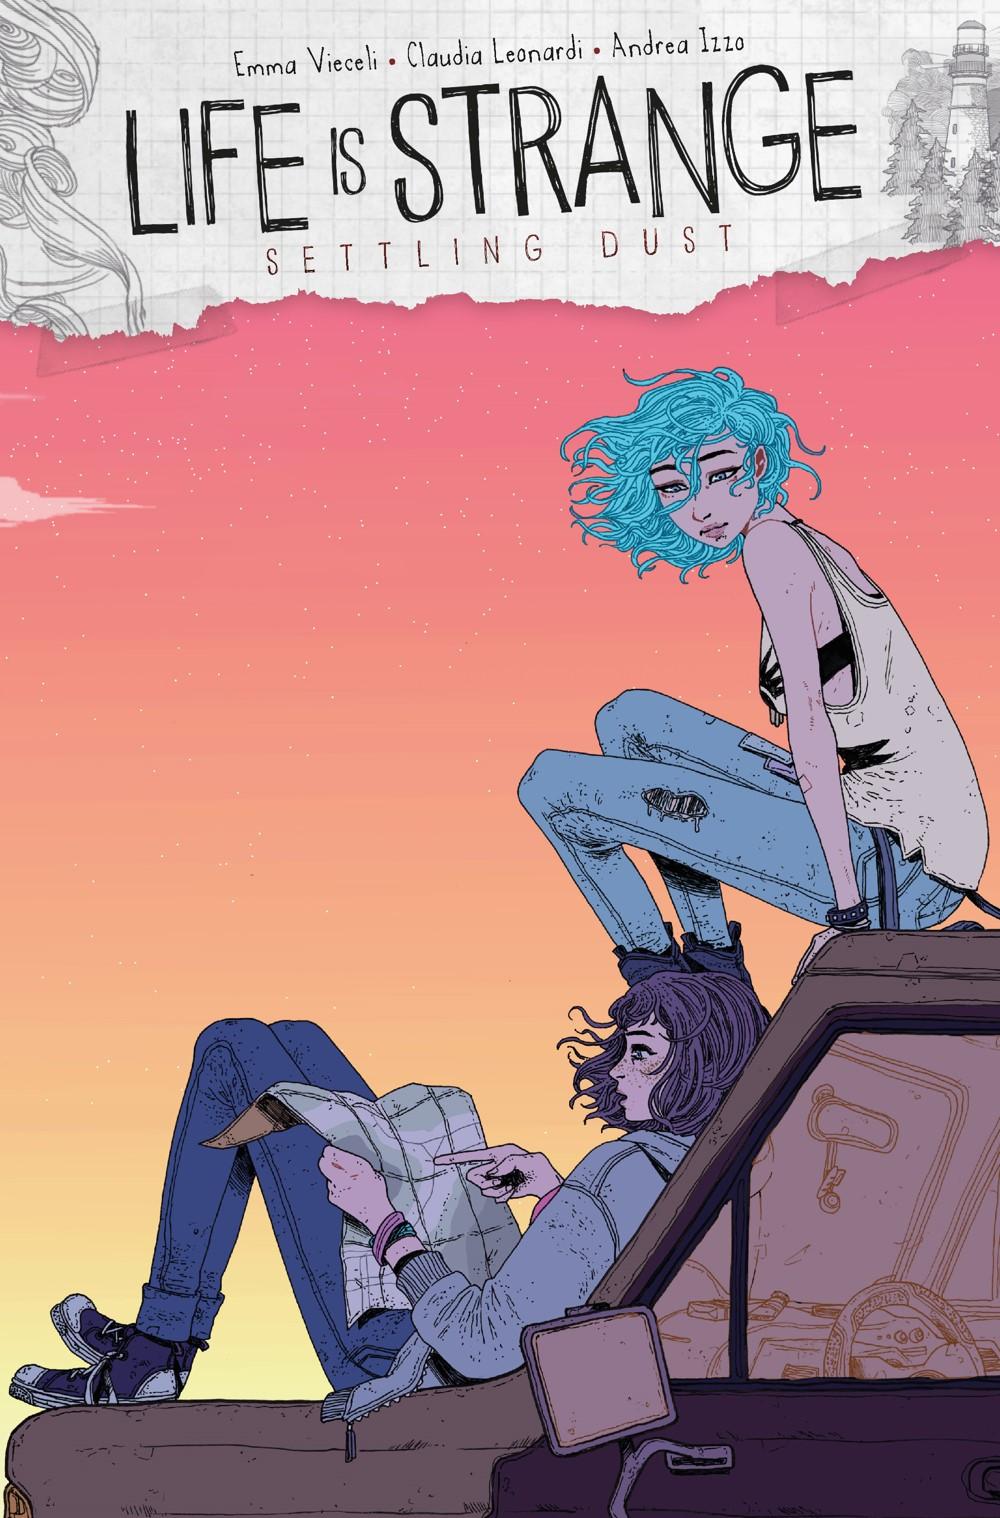 LIFE-IS-STRANGE-SETTLING-DUST-2-CVR-D-THOROGOOD Titan Comics October 2021 Solicitations